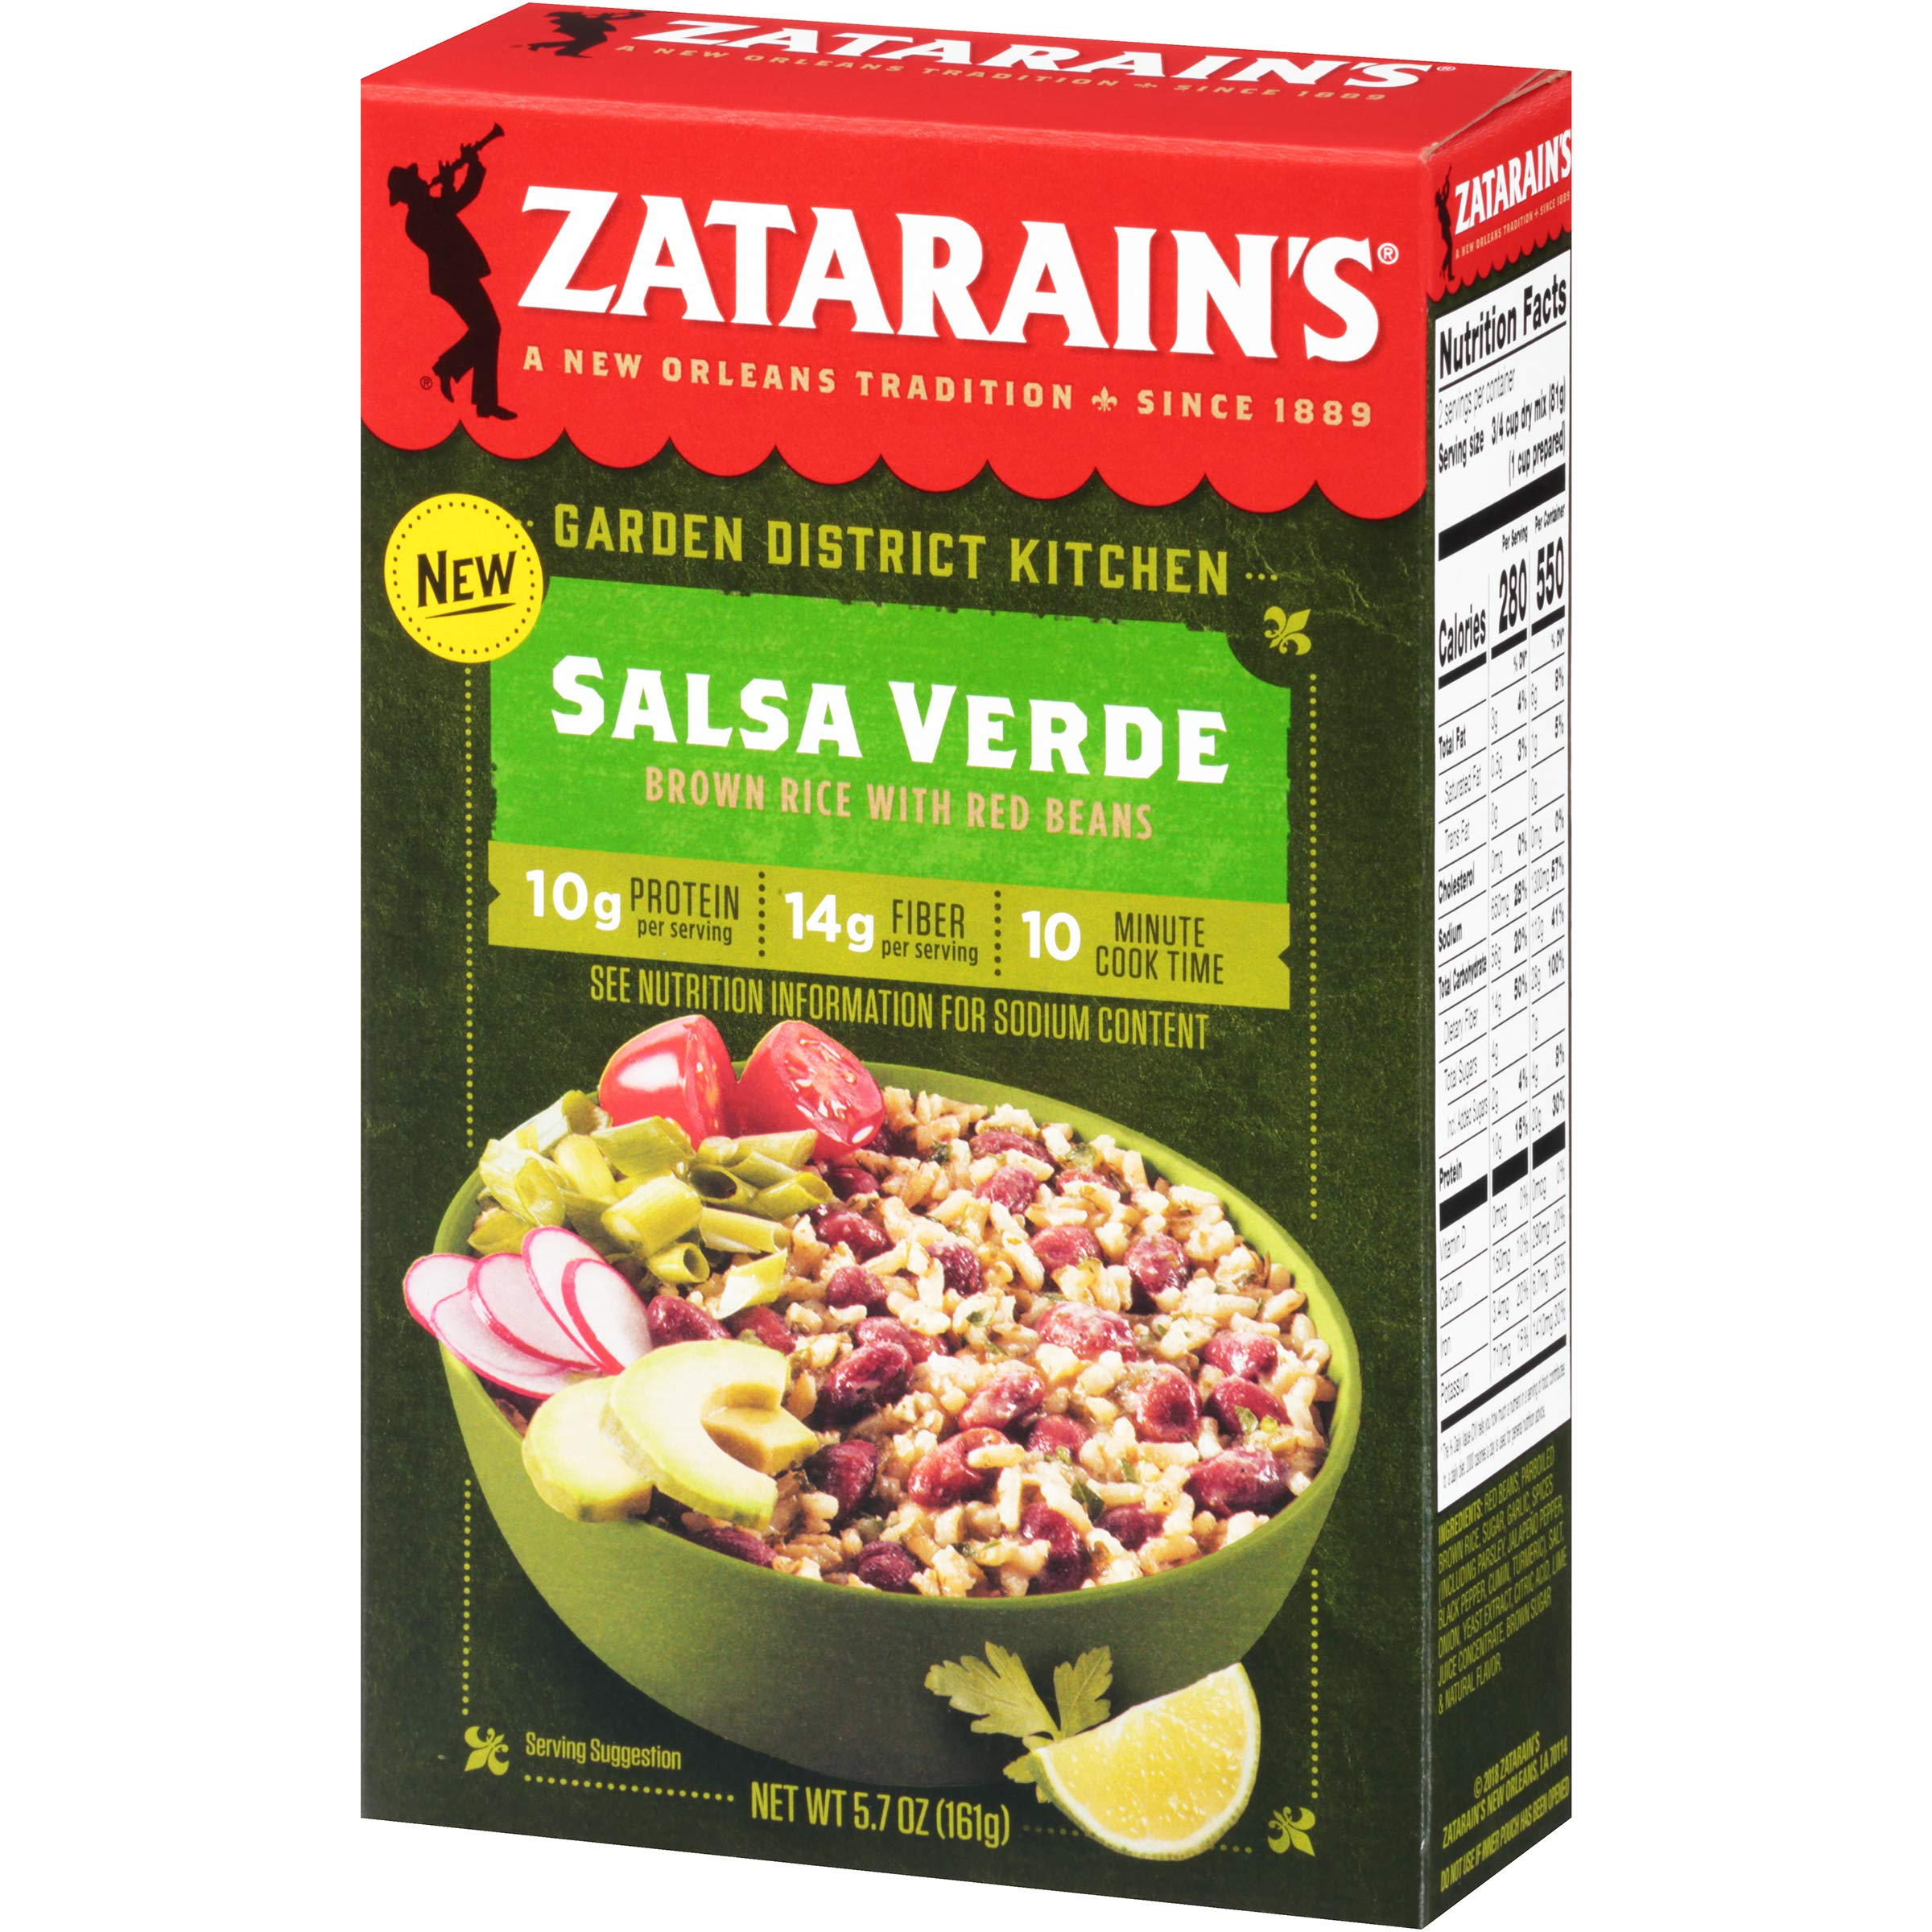 Zatarain's Salsa Verde Brown Rice With Red Beans, 5.7 oz by Zatarain's